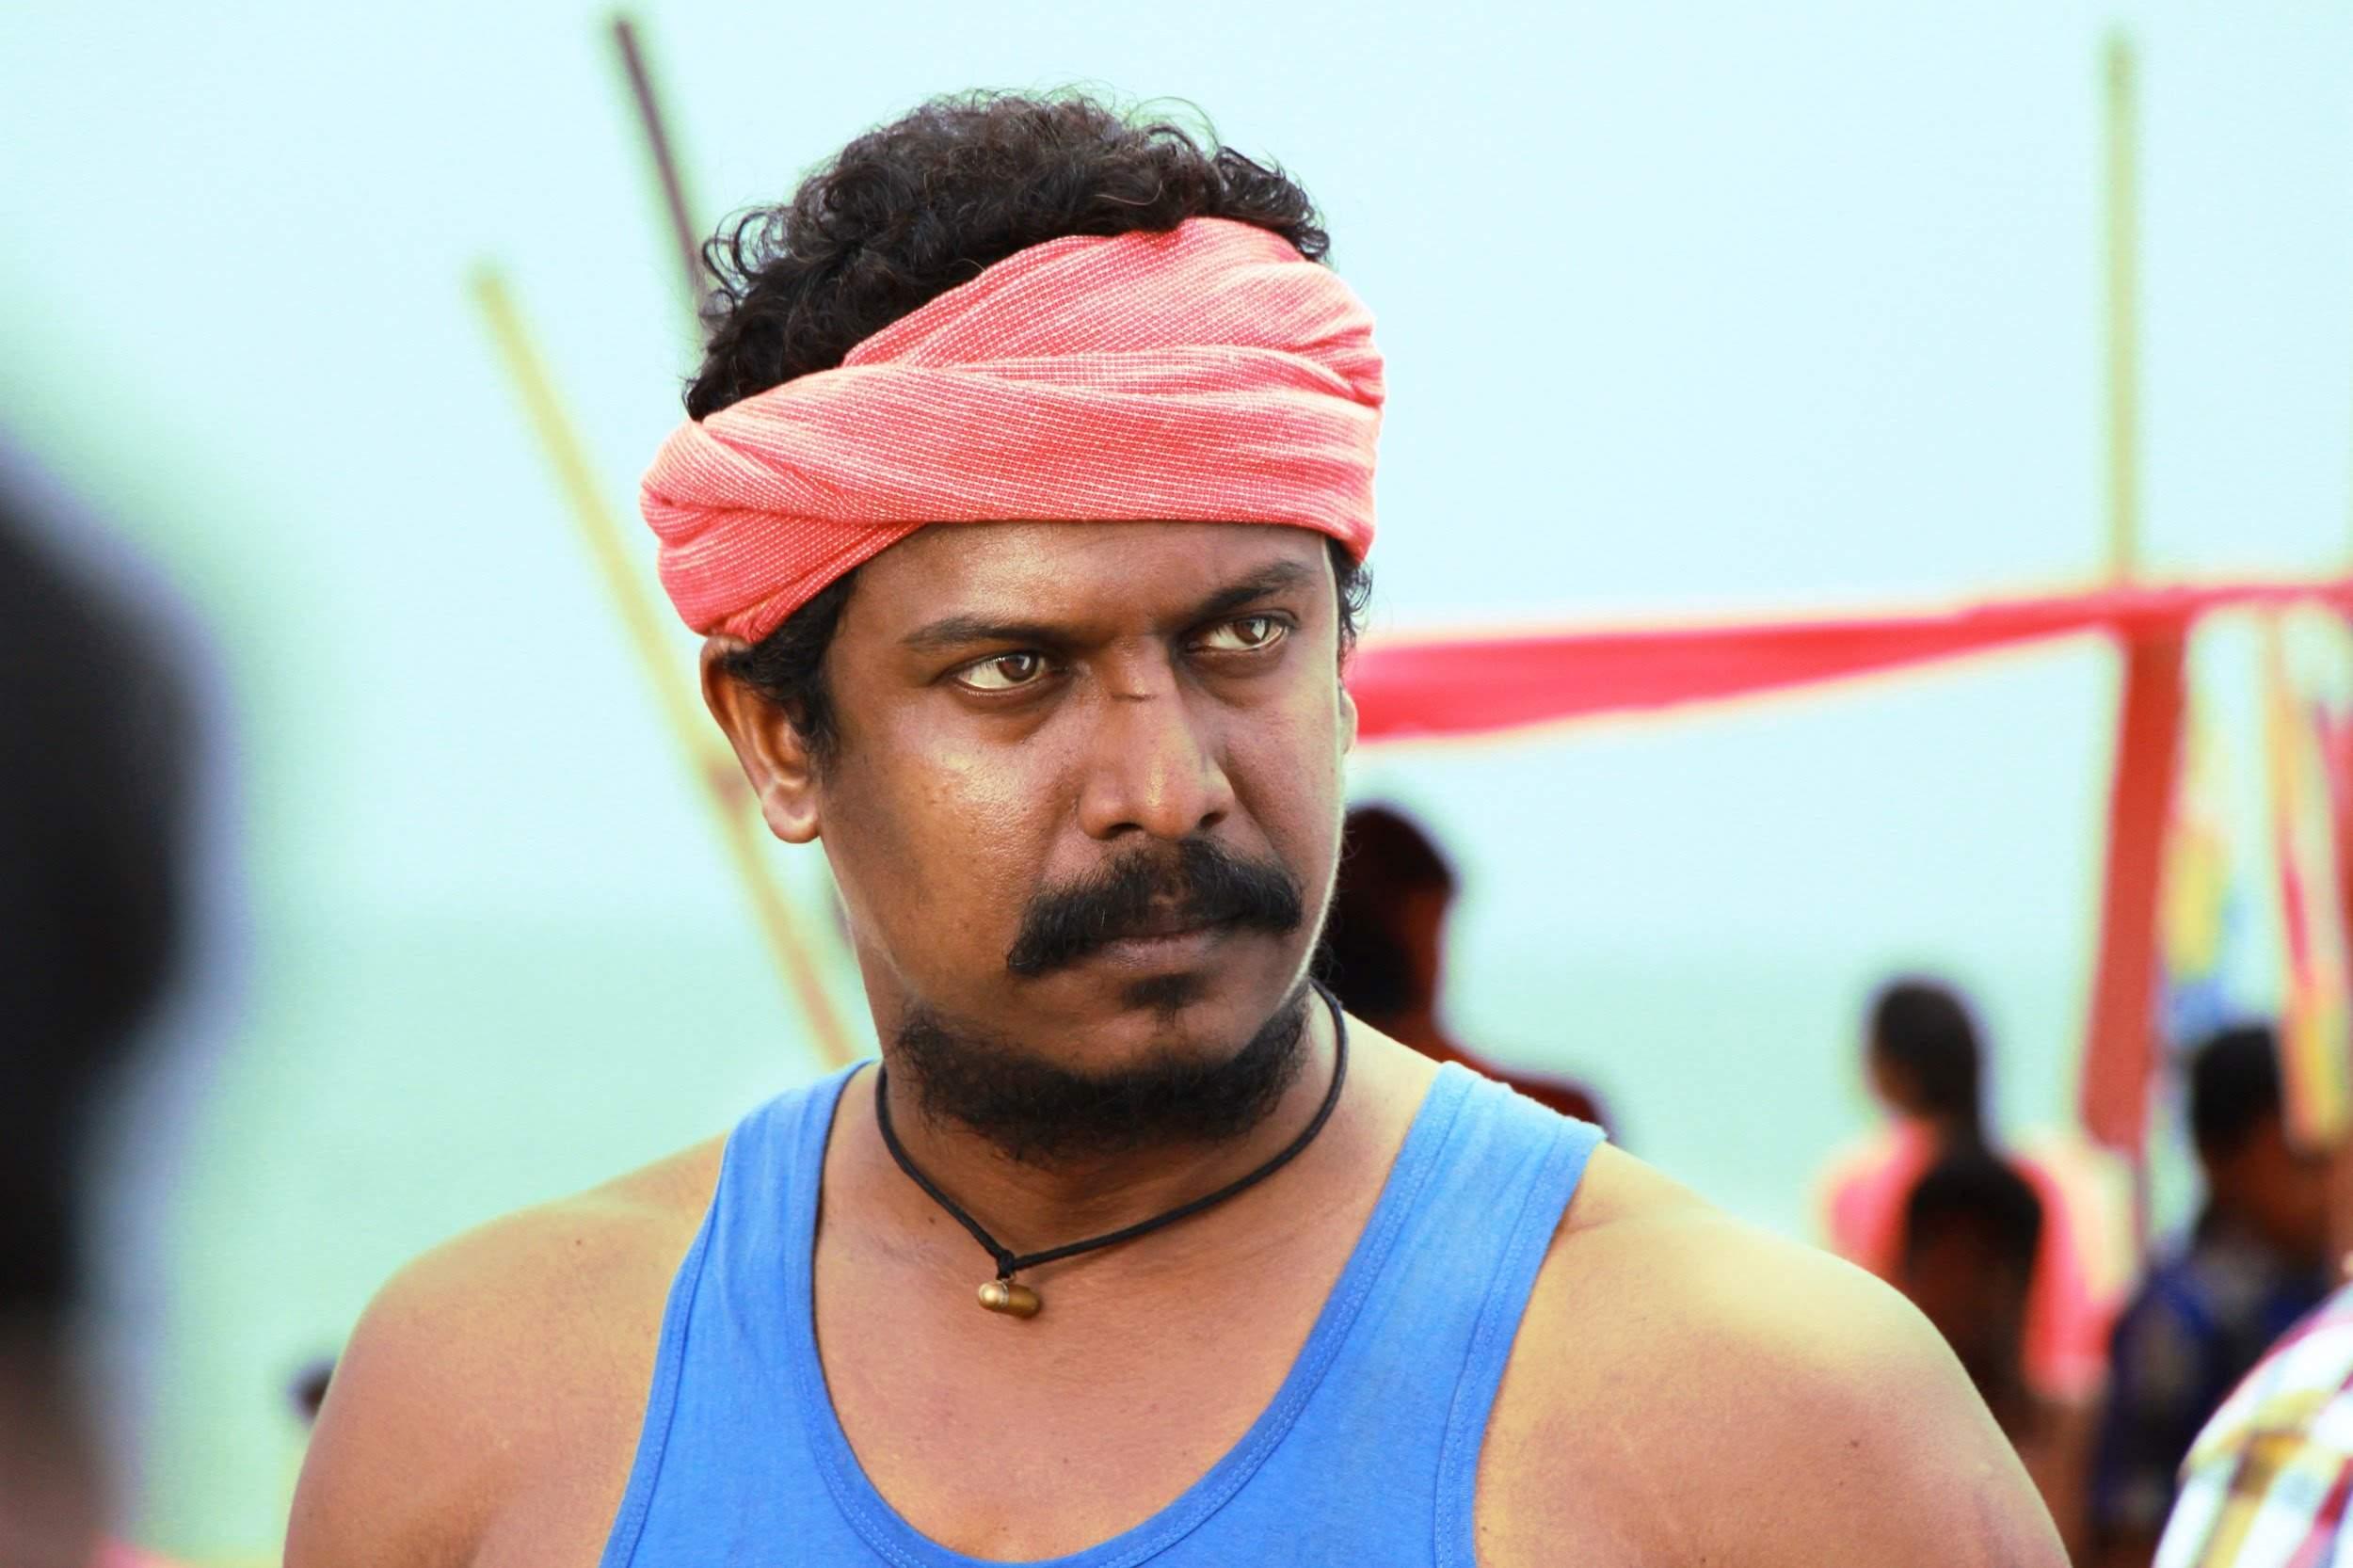 https://cdn.tamilspark.com/media/16336w4n-Samuthirakani.jpg